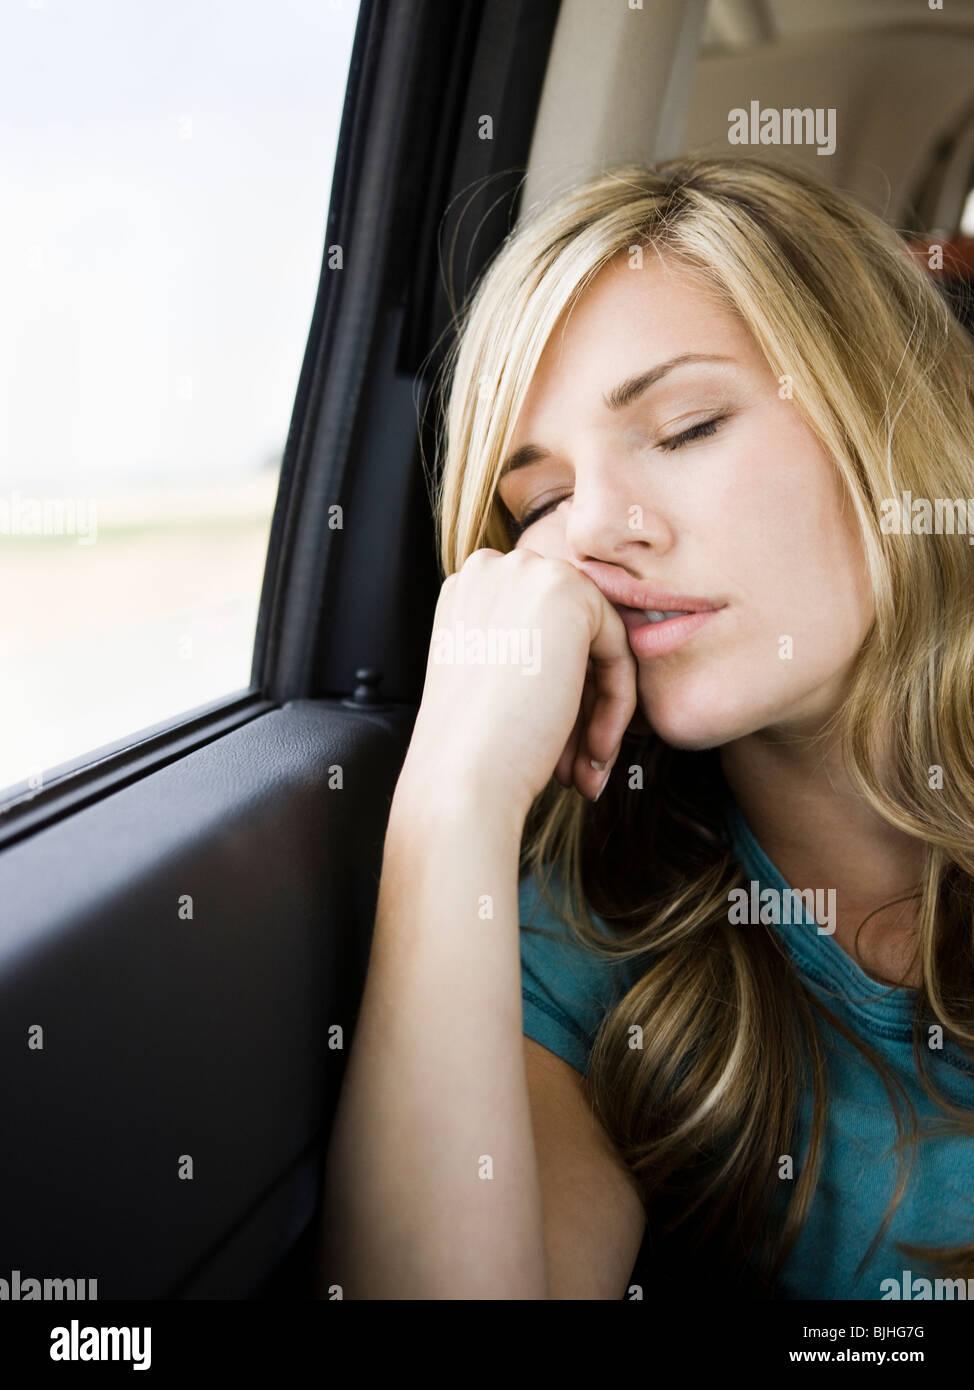 woman sleeping in the car - Stock Image